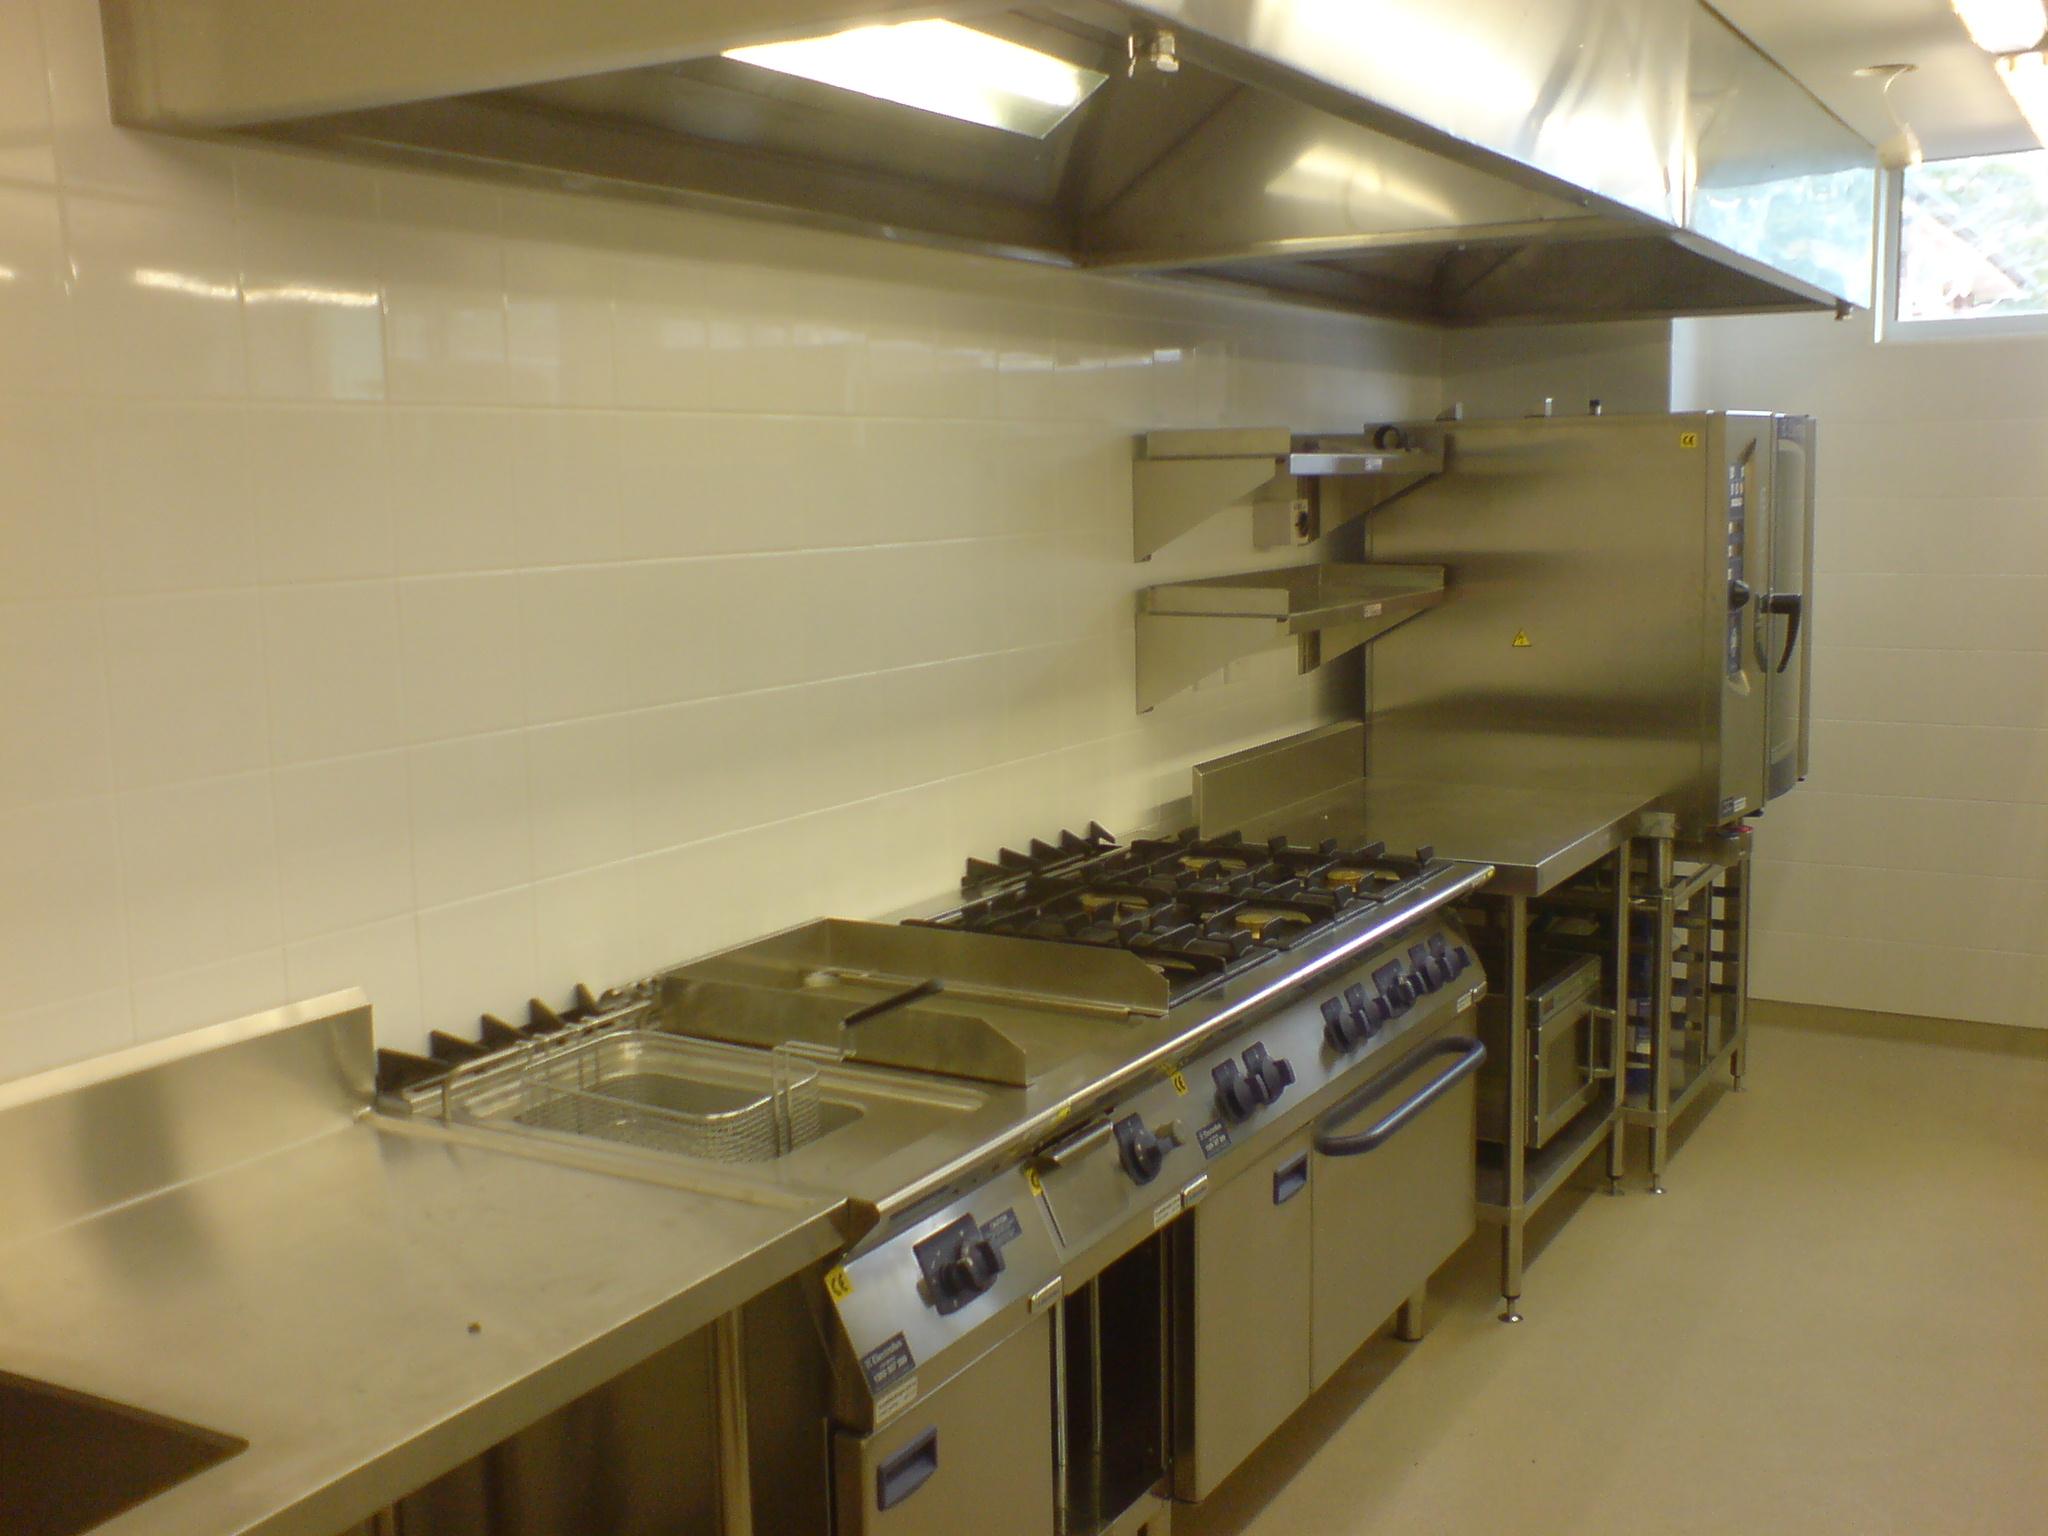 commercial kitchen equipment design commercial kitchen design equipment hoods sinks messagenote